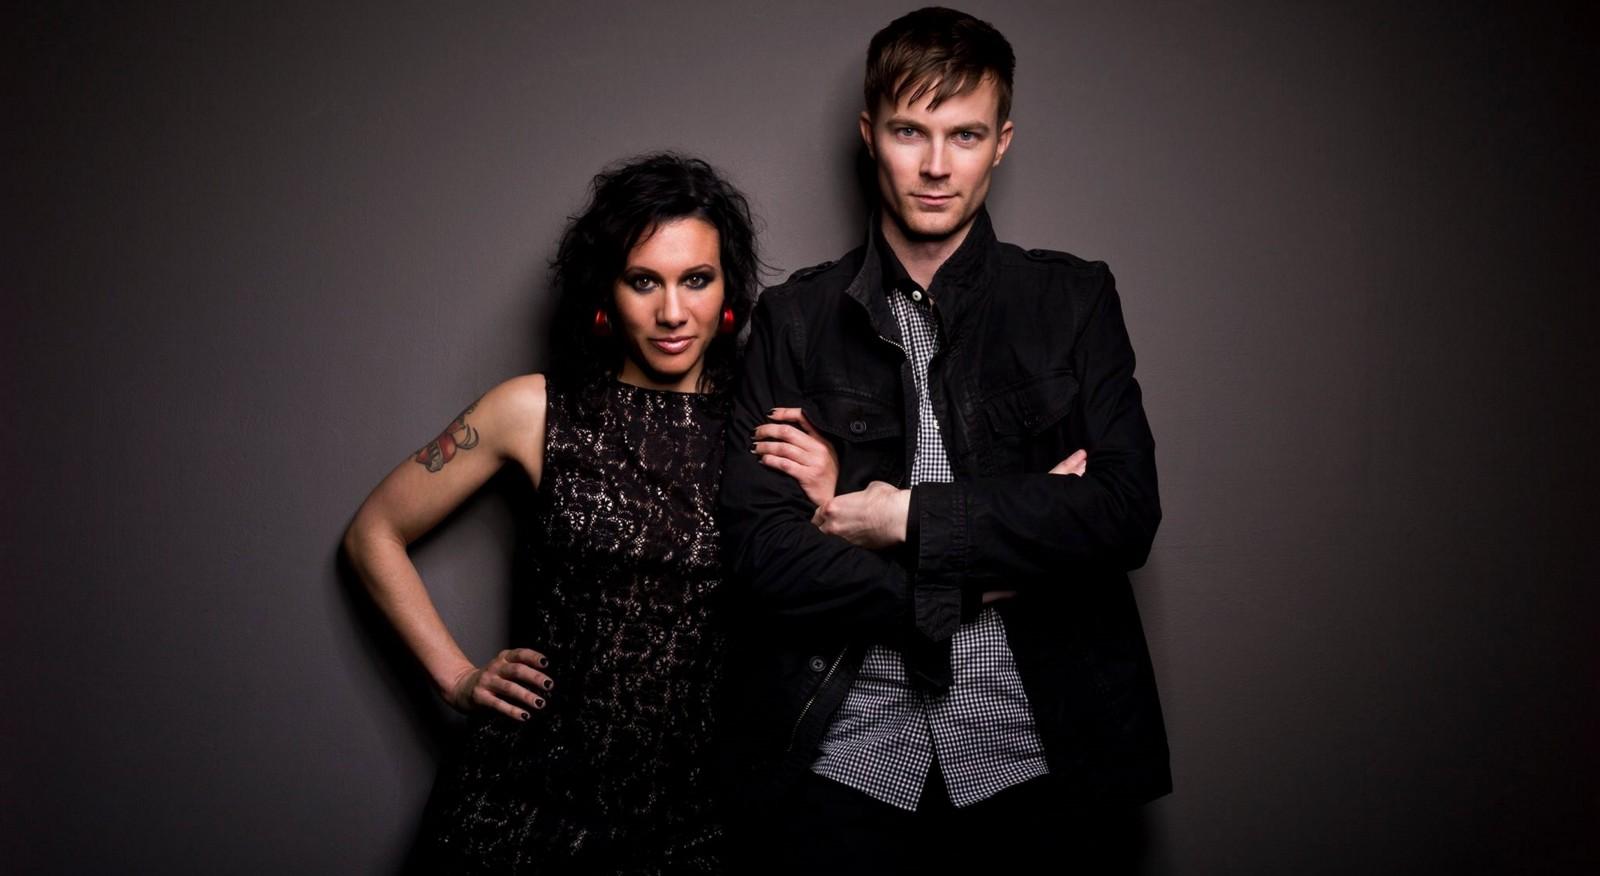 Matt and Kim headline the first show in the Canalside summer concert season Thursday.